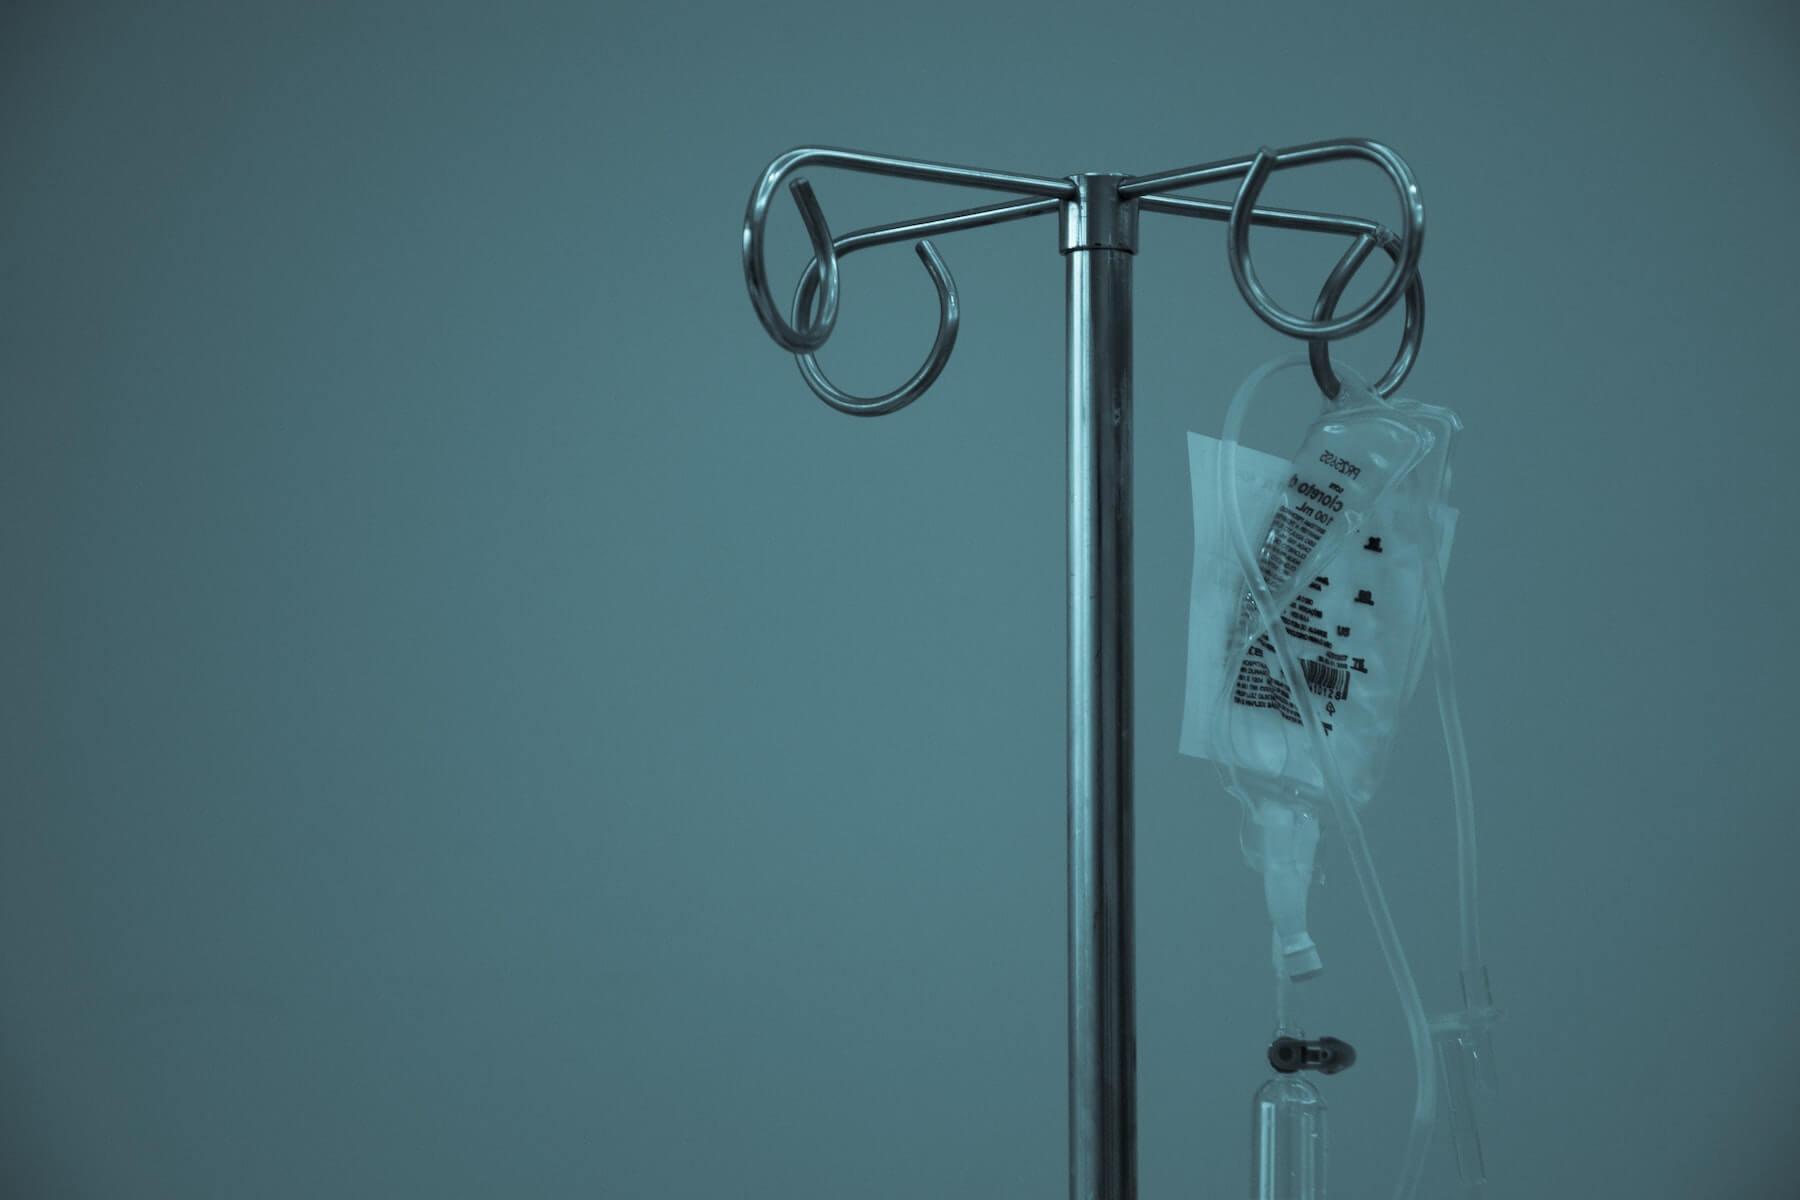 iv drop hanging on rack critical care nursing